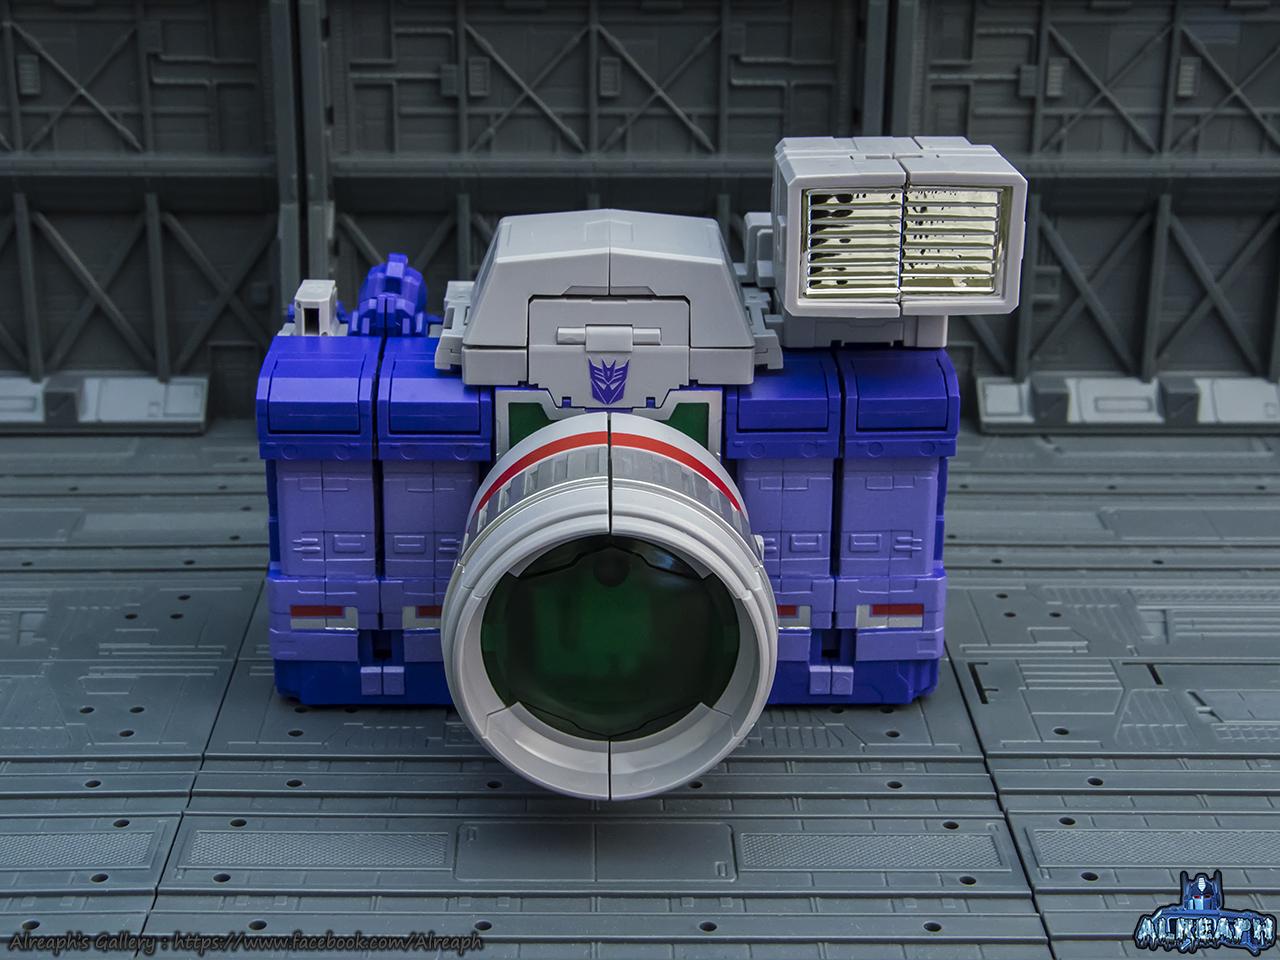 [Fanstoys] Produit Tiers - Jouet FT-11 Spotter - aka Reflector/Réflecteur - Page 2 LleCwvbN